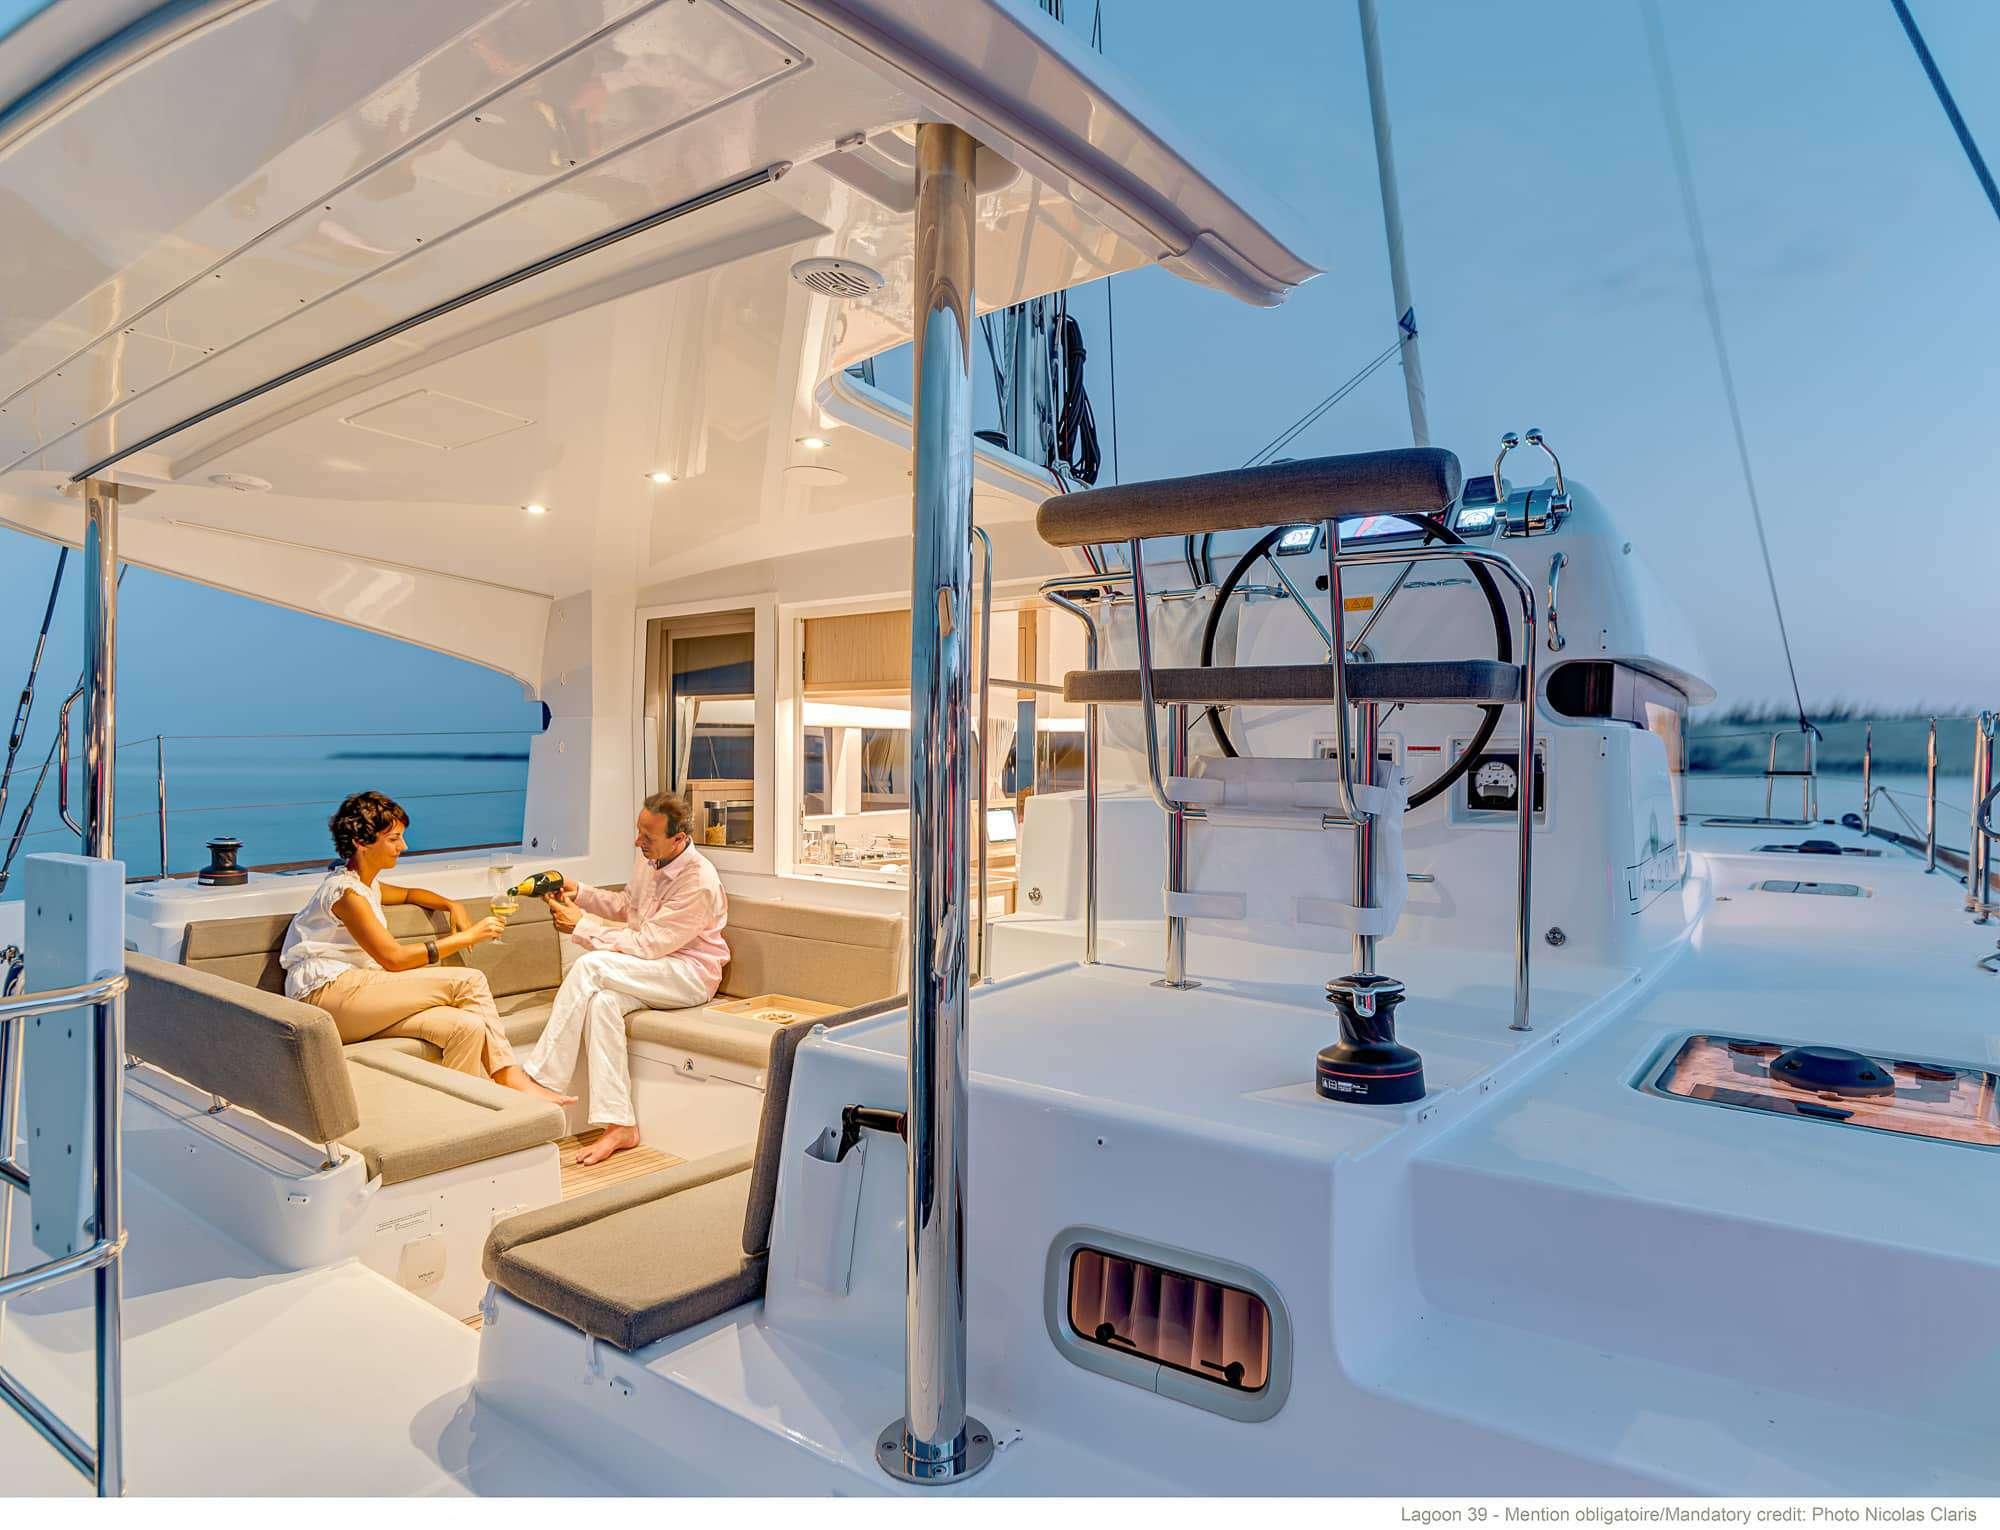 lagoon 39-yacht-charter-croatia-sailing-holidays-croatia-booking-yacht-charter-croatia-catamarans-sailboats-motorboats-gulets-luxury-yachts-boat-rental-croatia